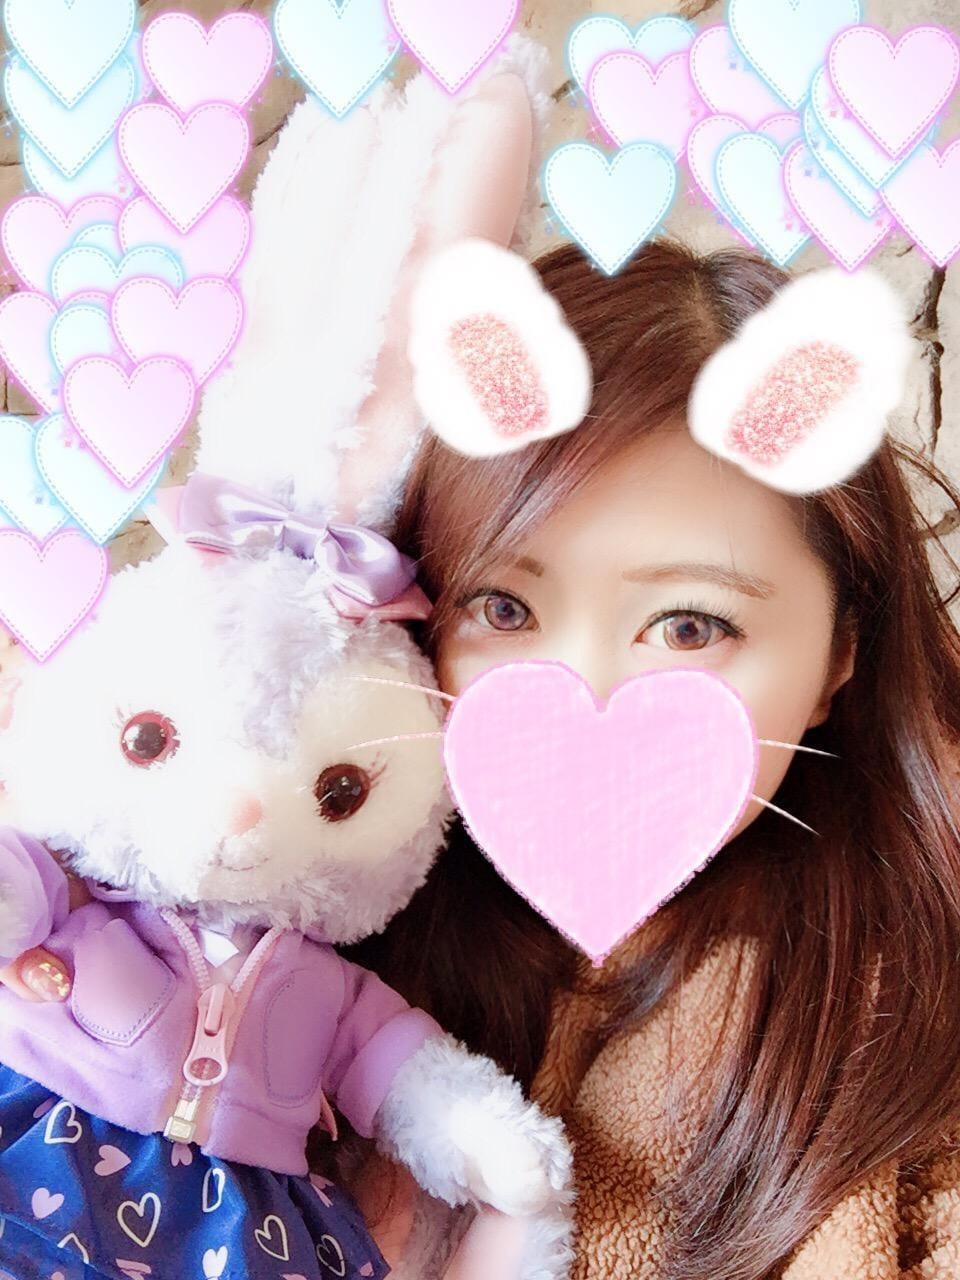 「February 22nd ★」02/22(02/22) 17:54 | まどかの写メ・風俗動画